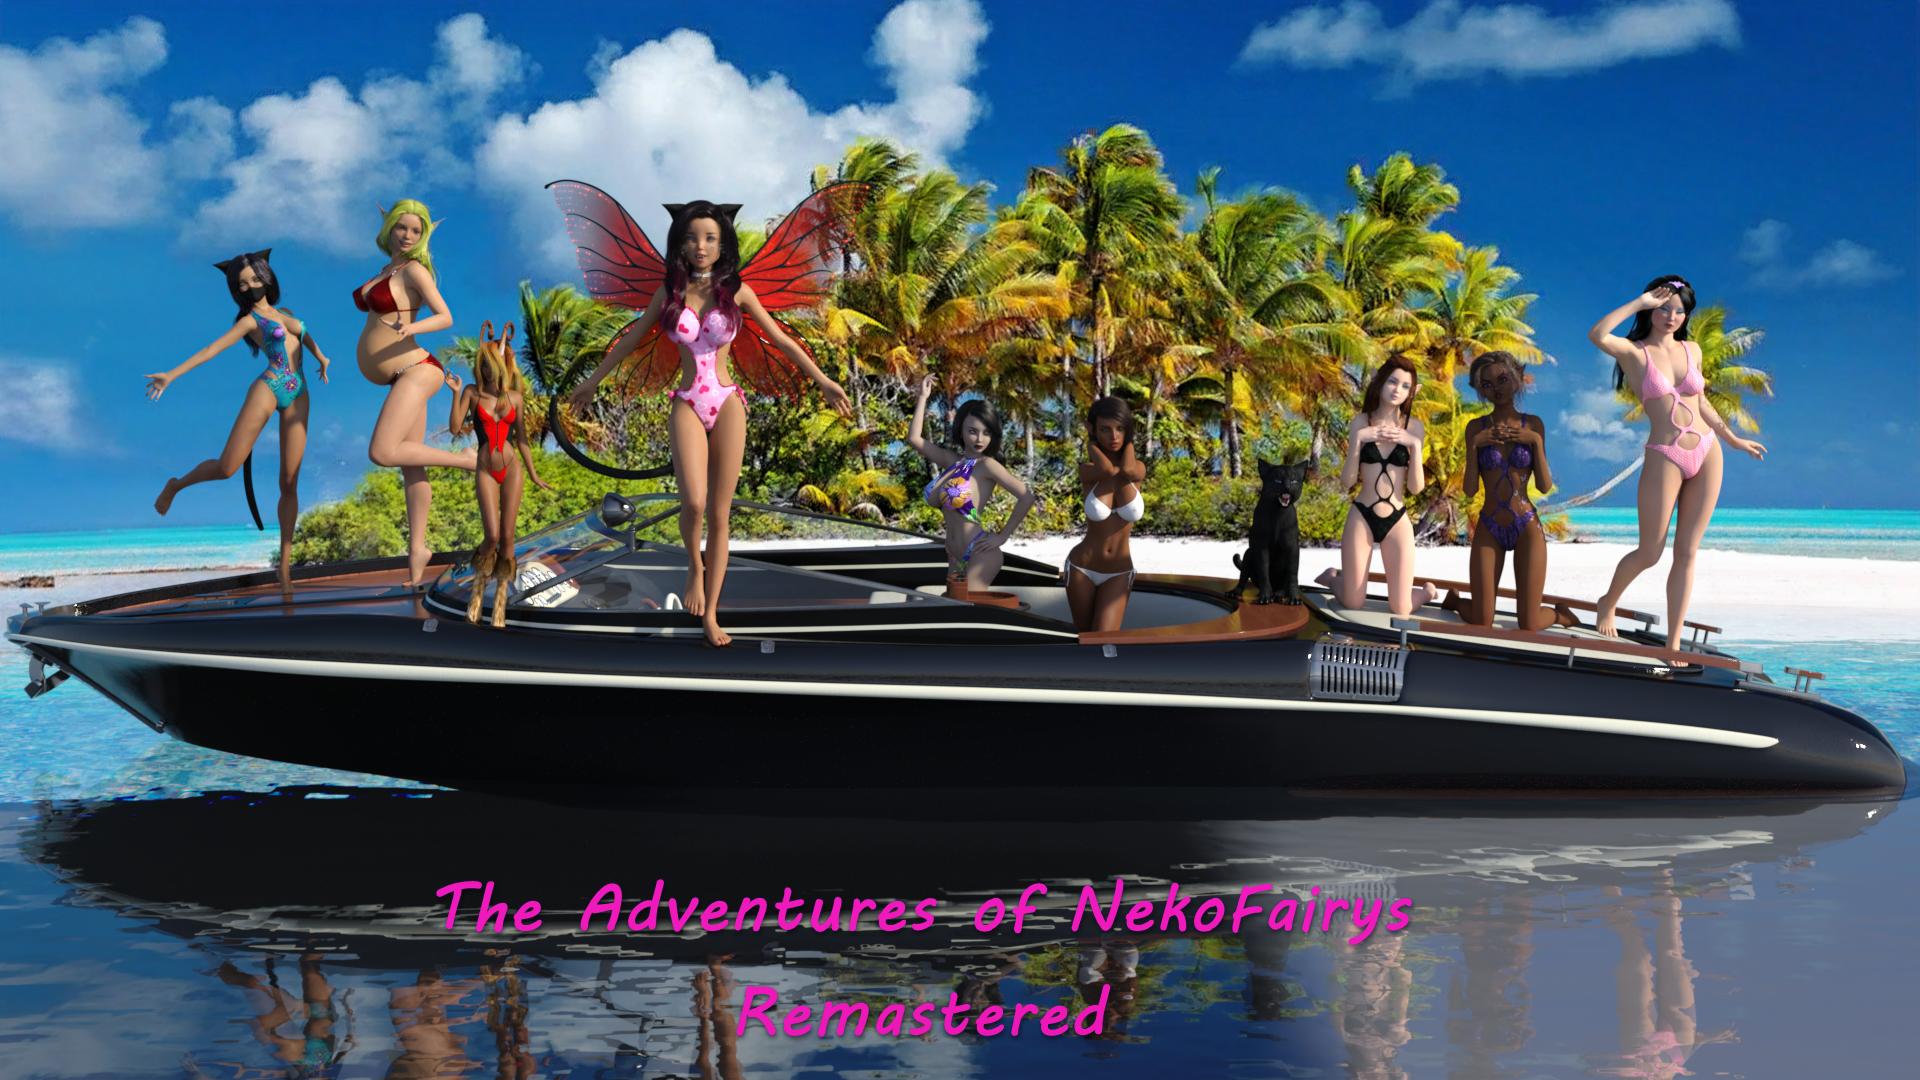 Game Neko Fairys Remastered Ep1 v1.3.2 MOD